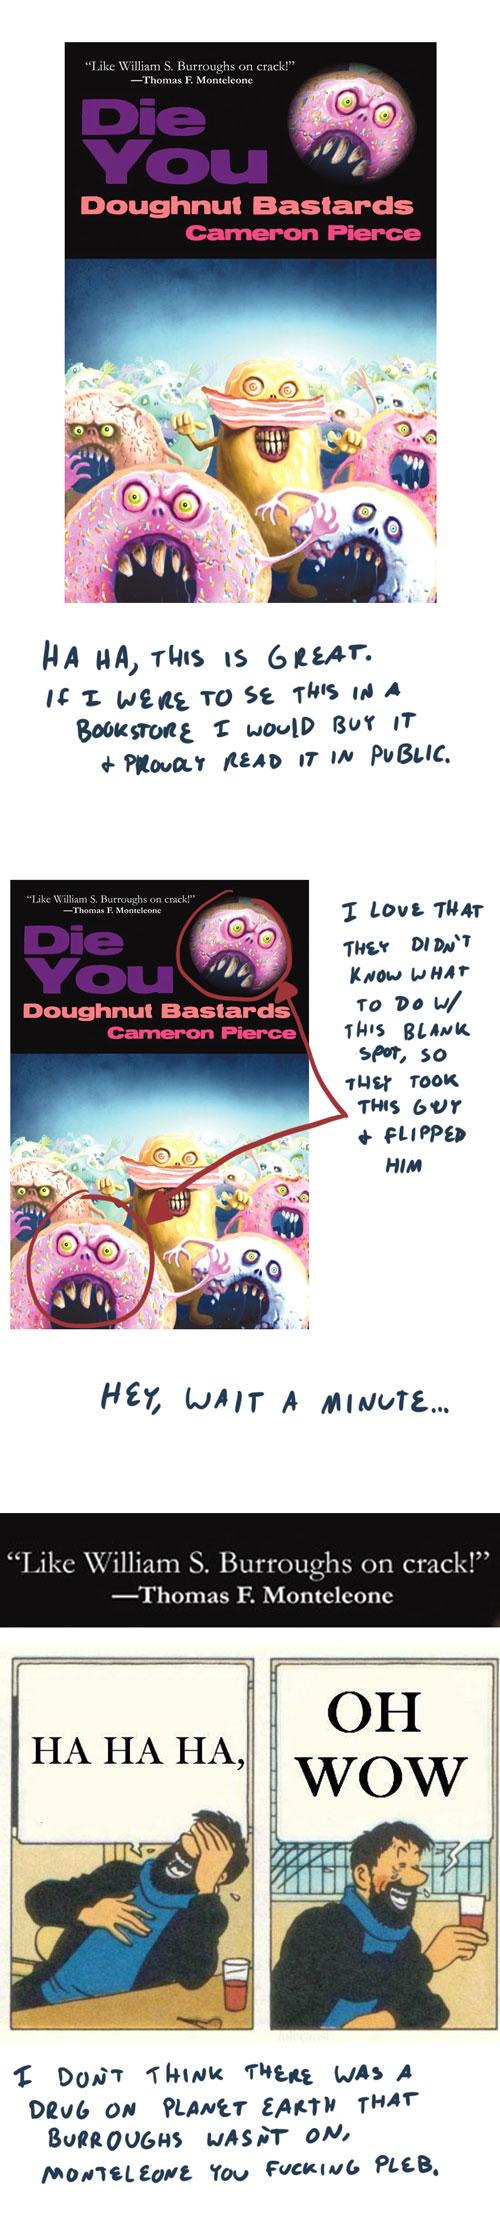 Die Doughnut